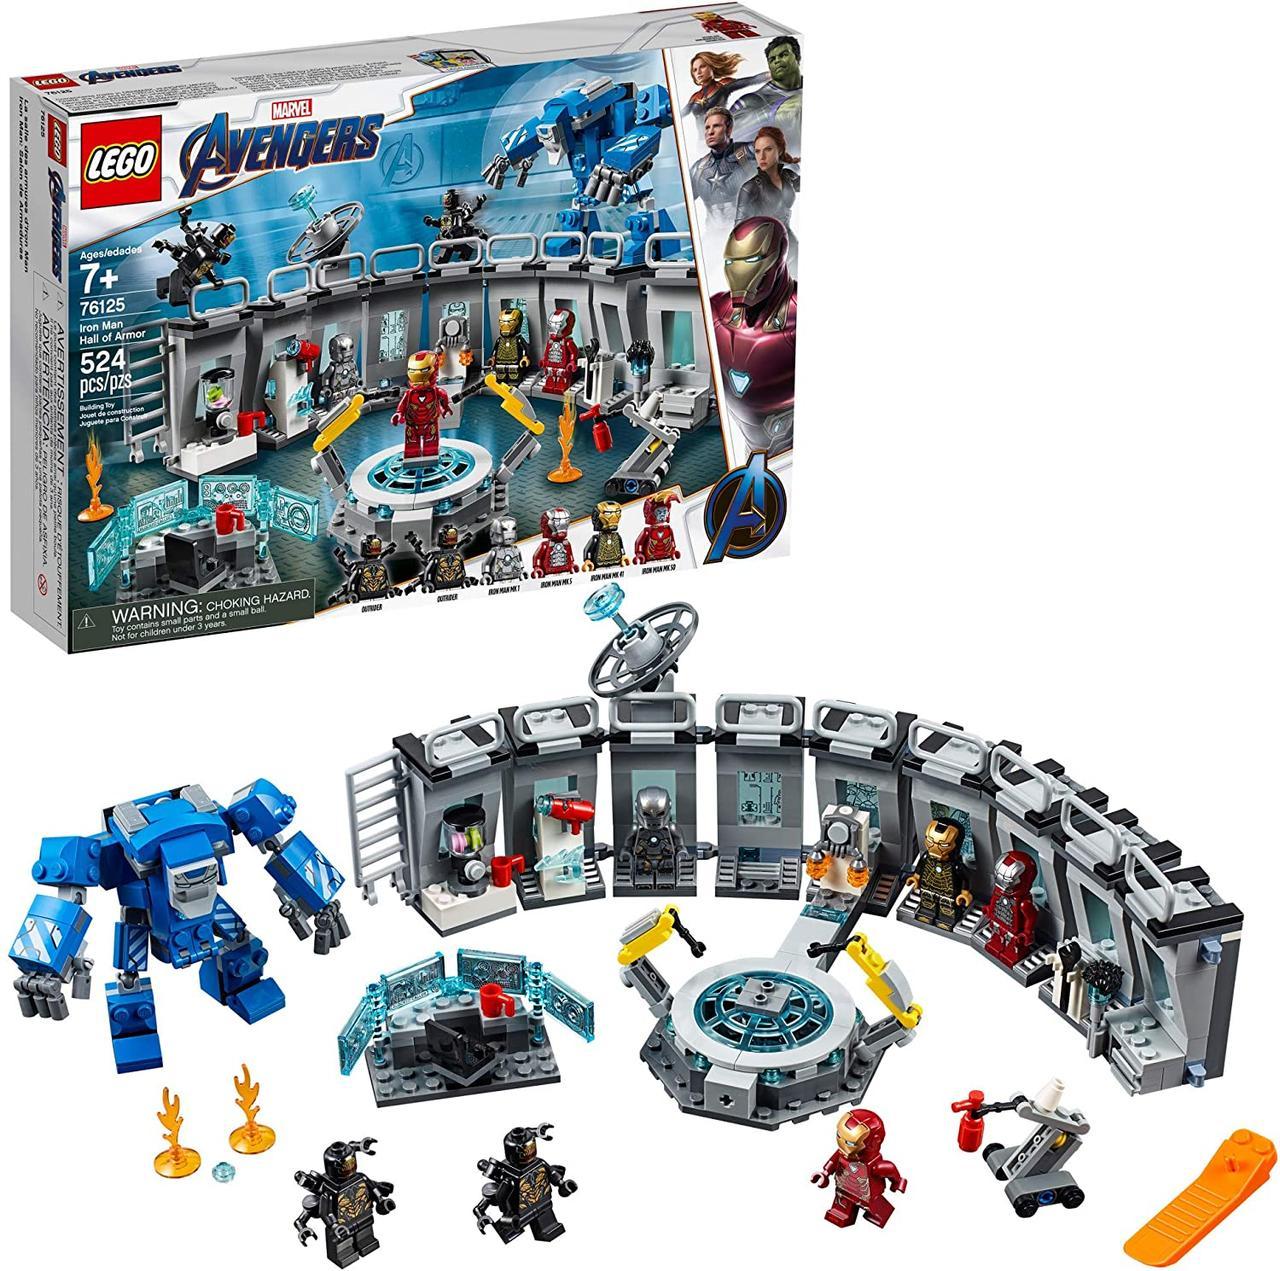 LEGO Super Heroes Лаборатория Железного Человека LEGO Marvel Avengers Iron Man Hall of Armor 524 эл